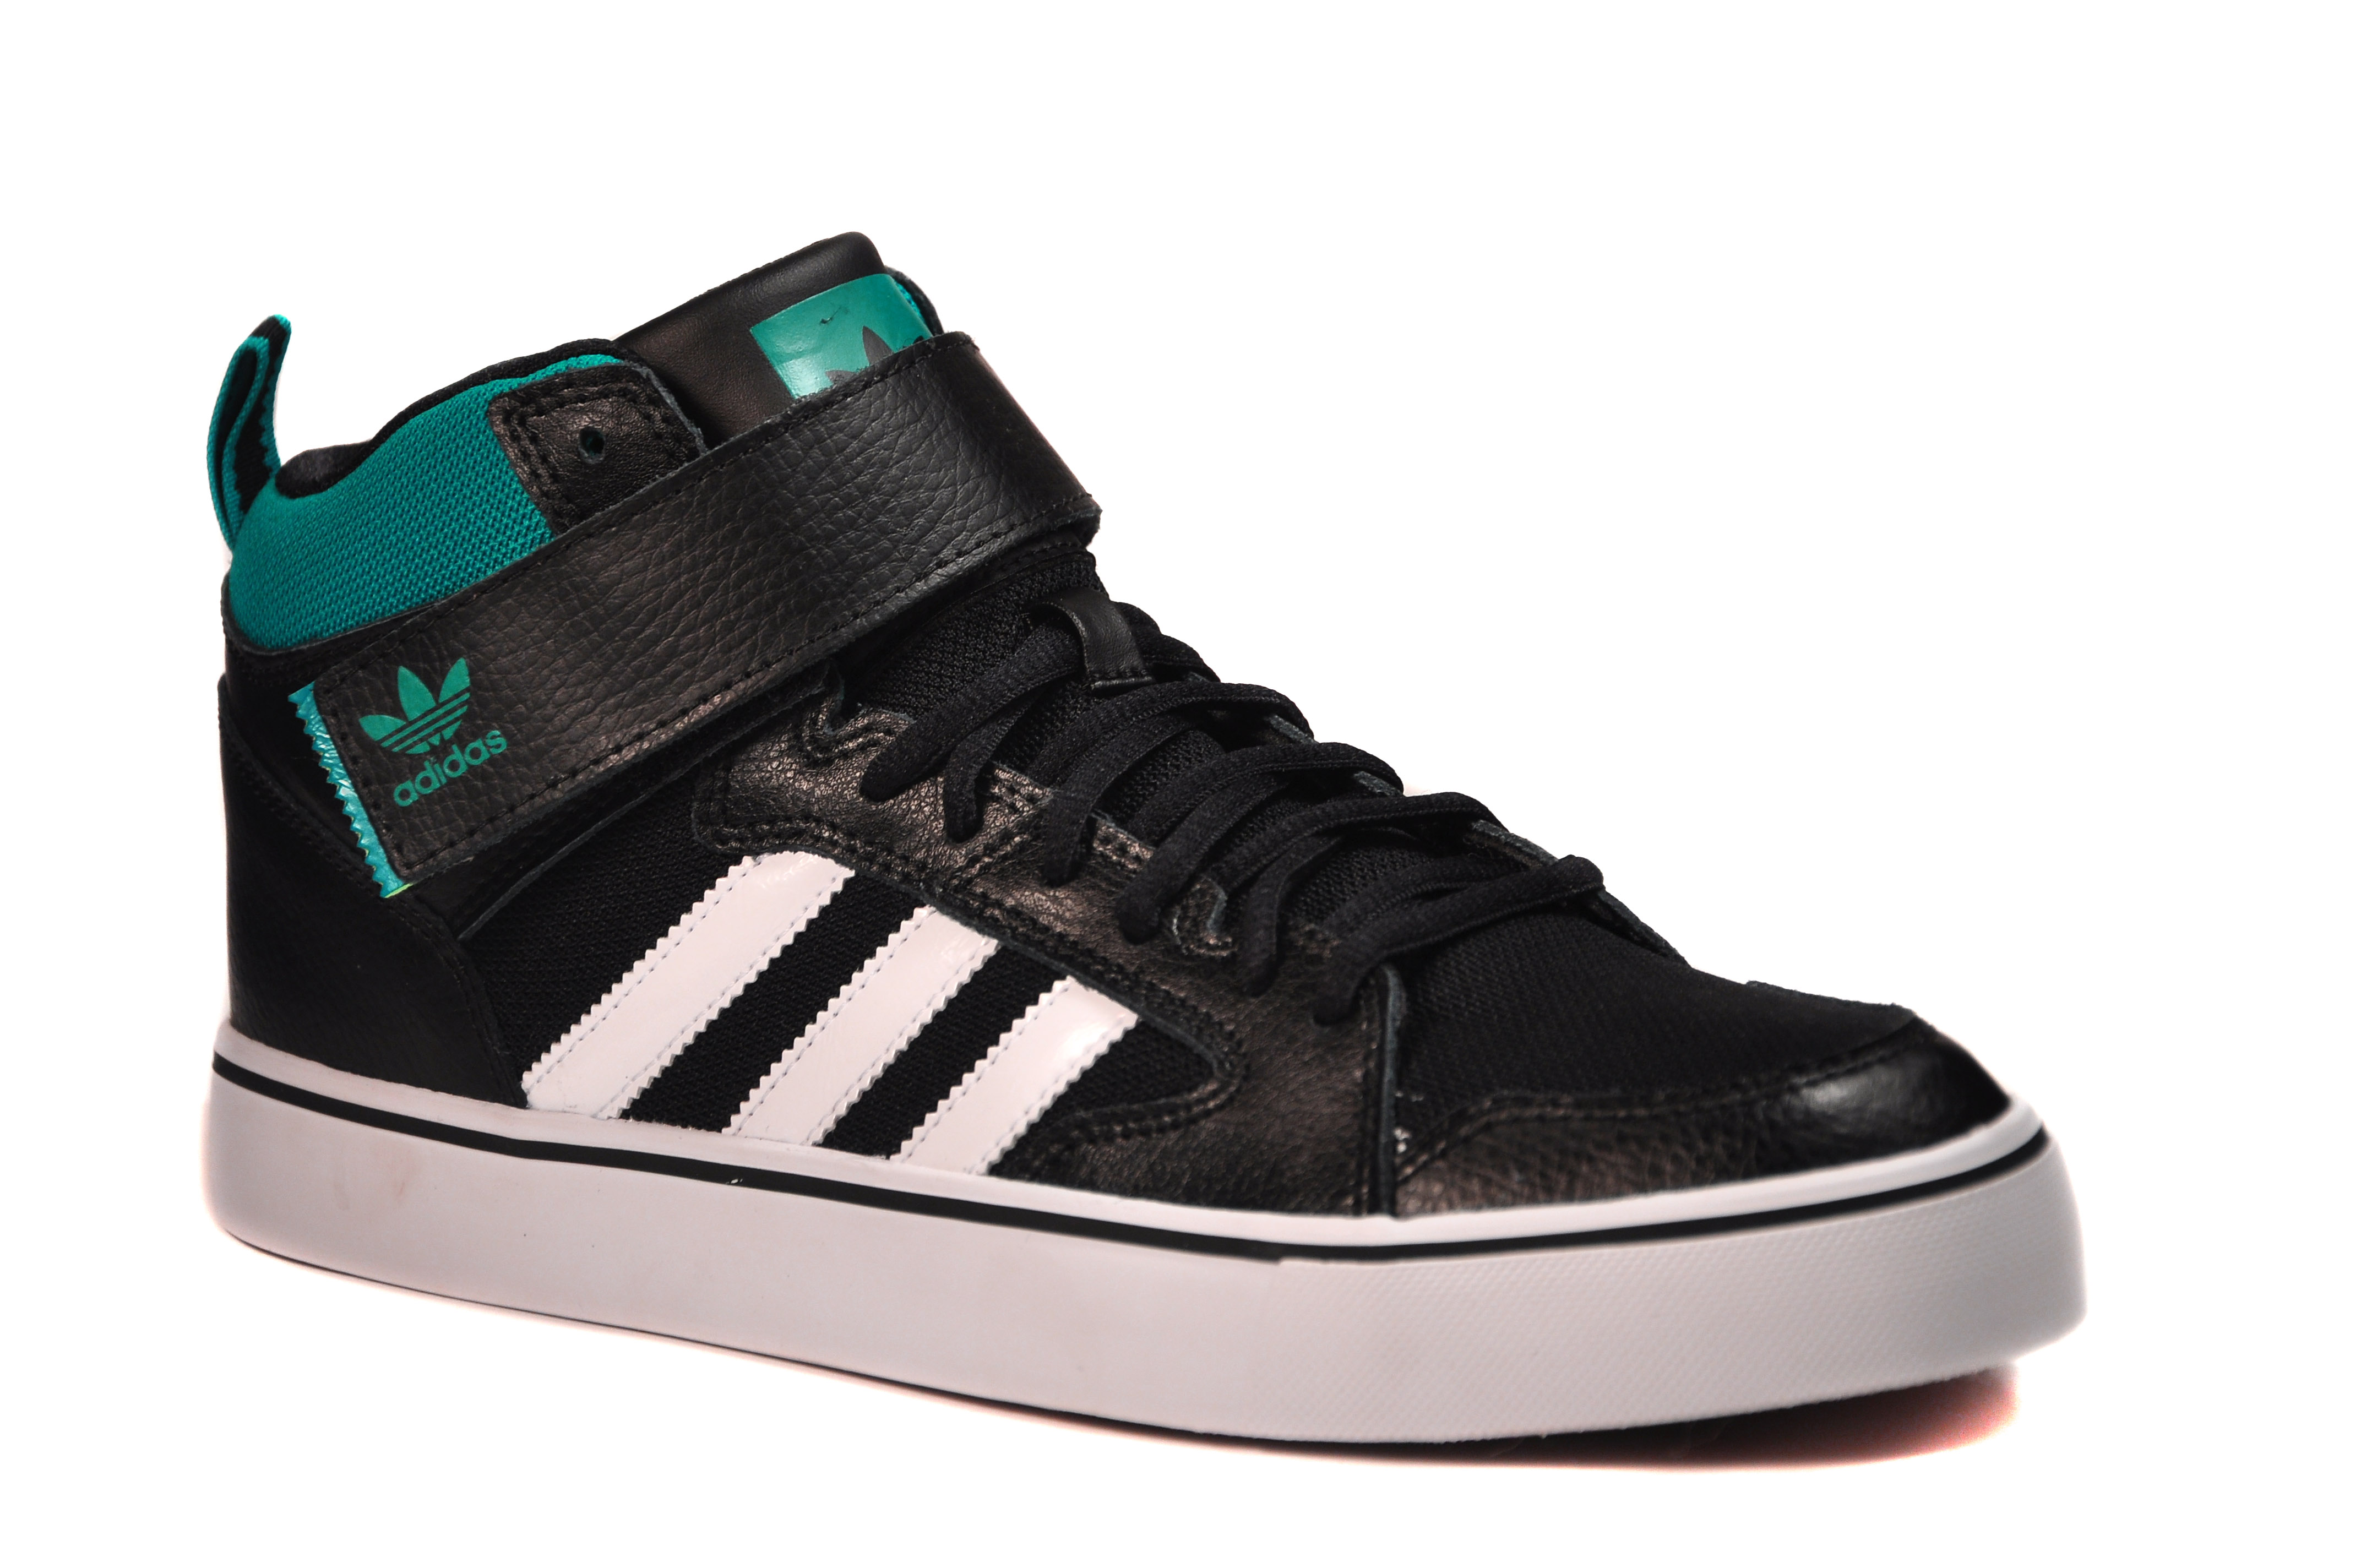 new style be695 7ca4e ZAPATILLAS SKATE VARIAL II MID. Marca  Adidas